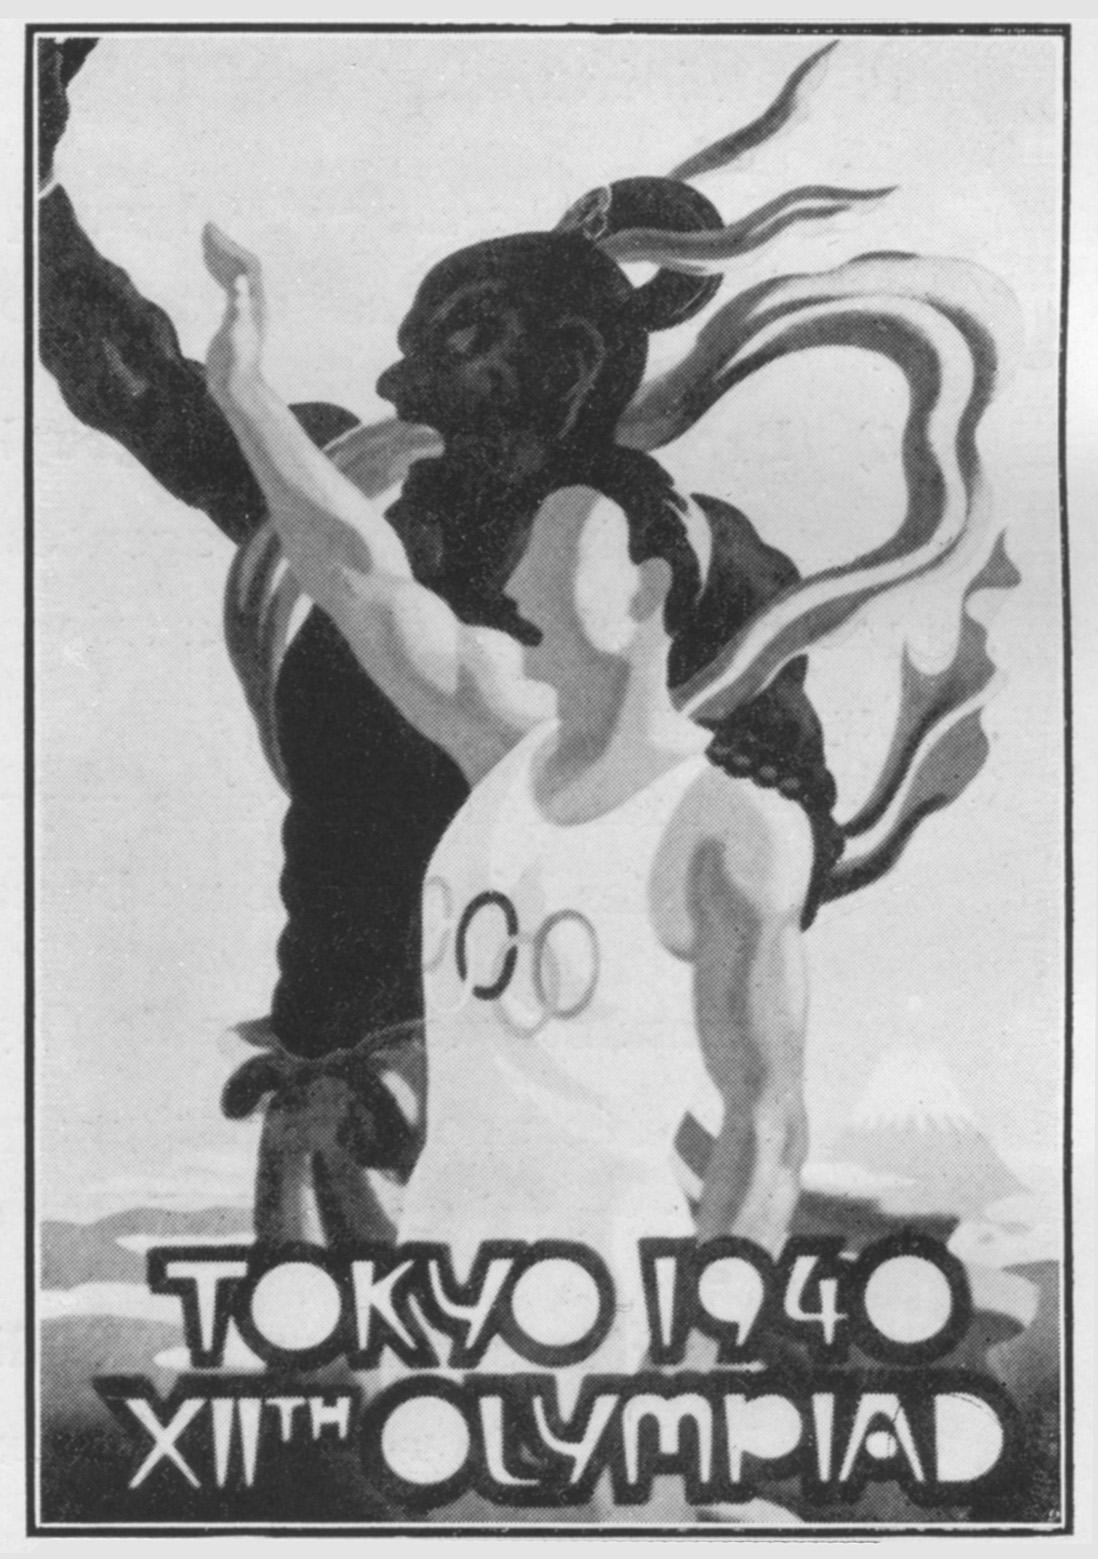 Storie Olimpiche - Tokyo 1940, le Olimpiadi mancate